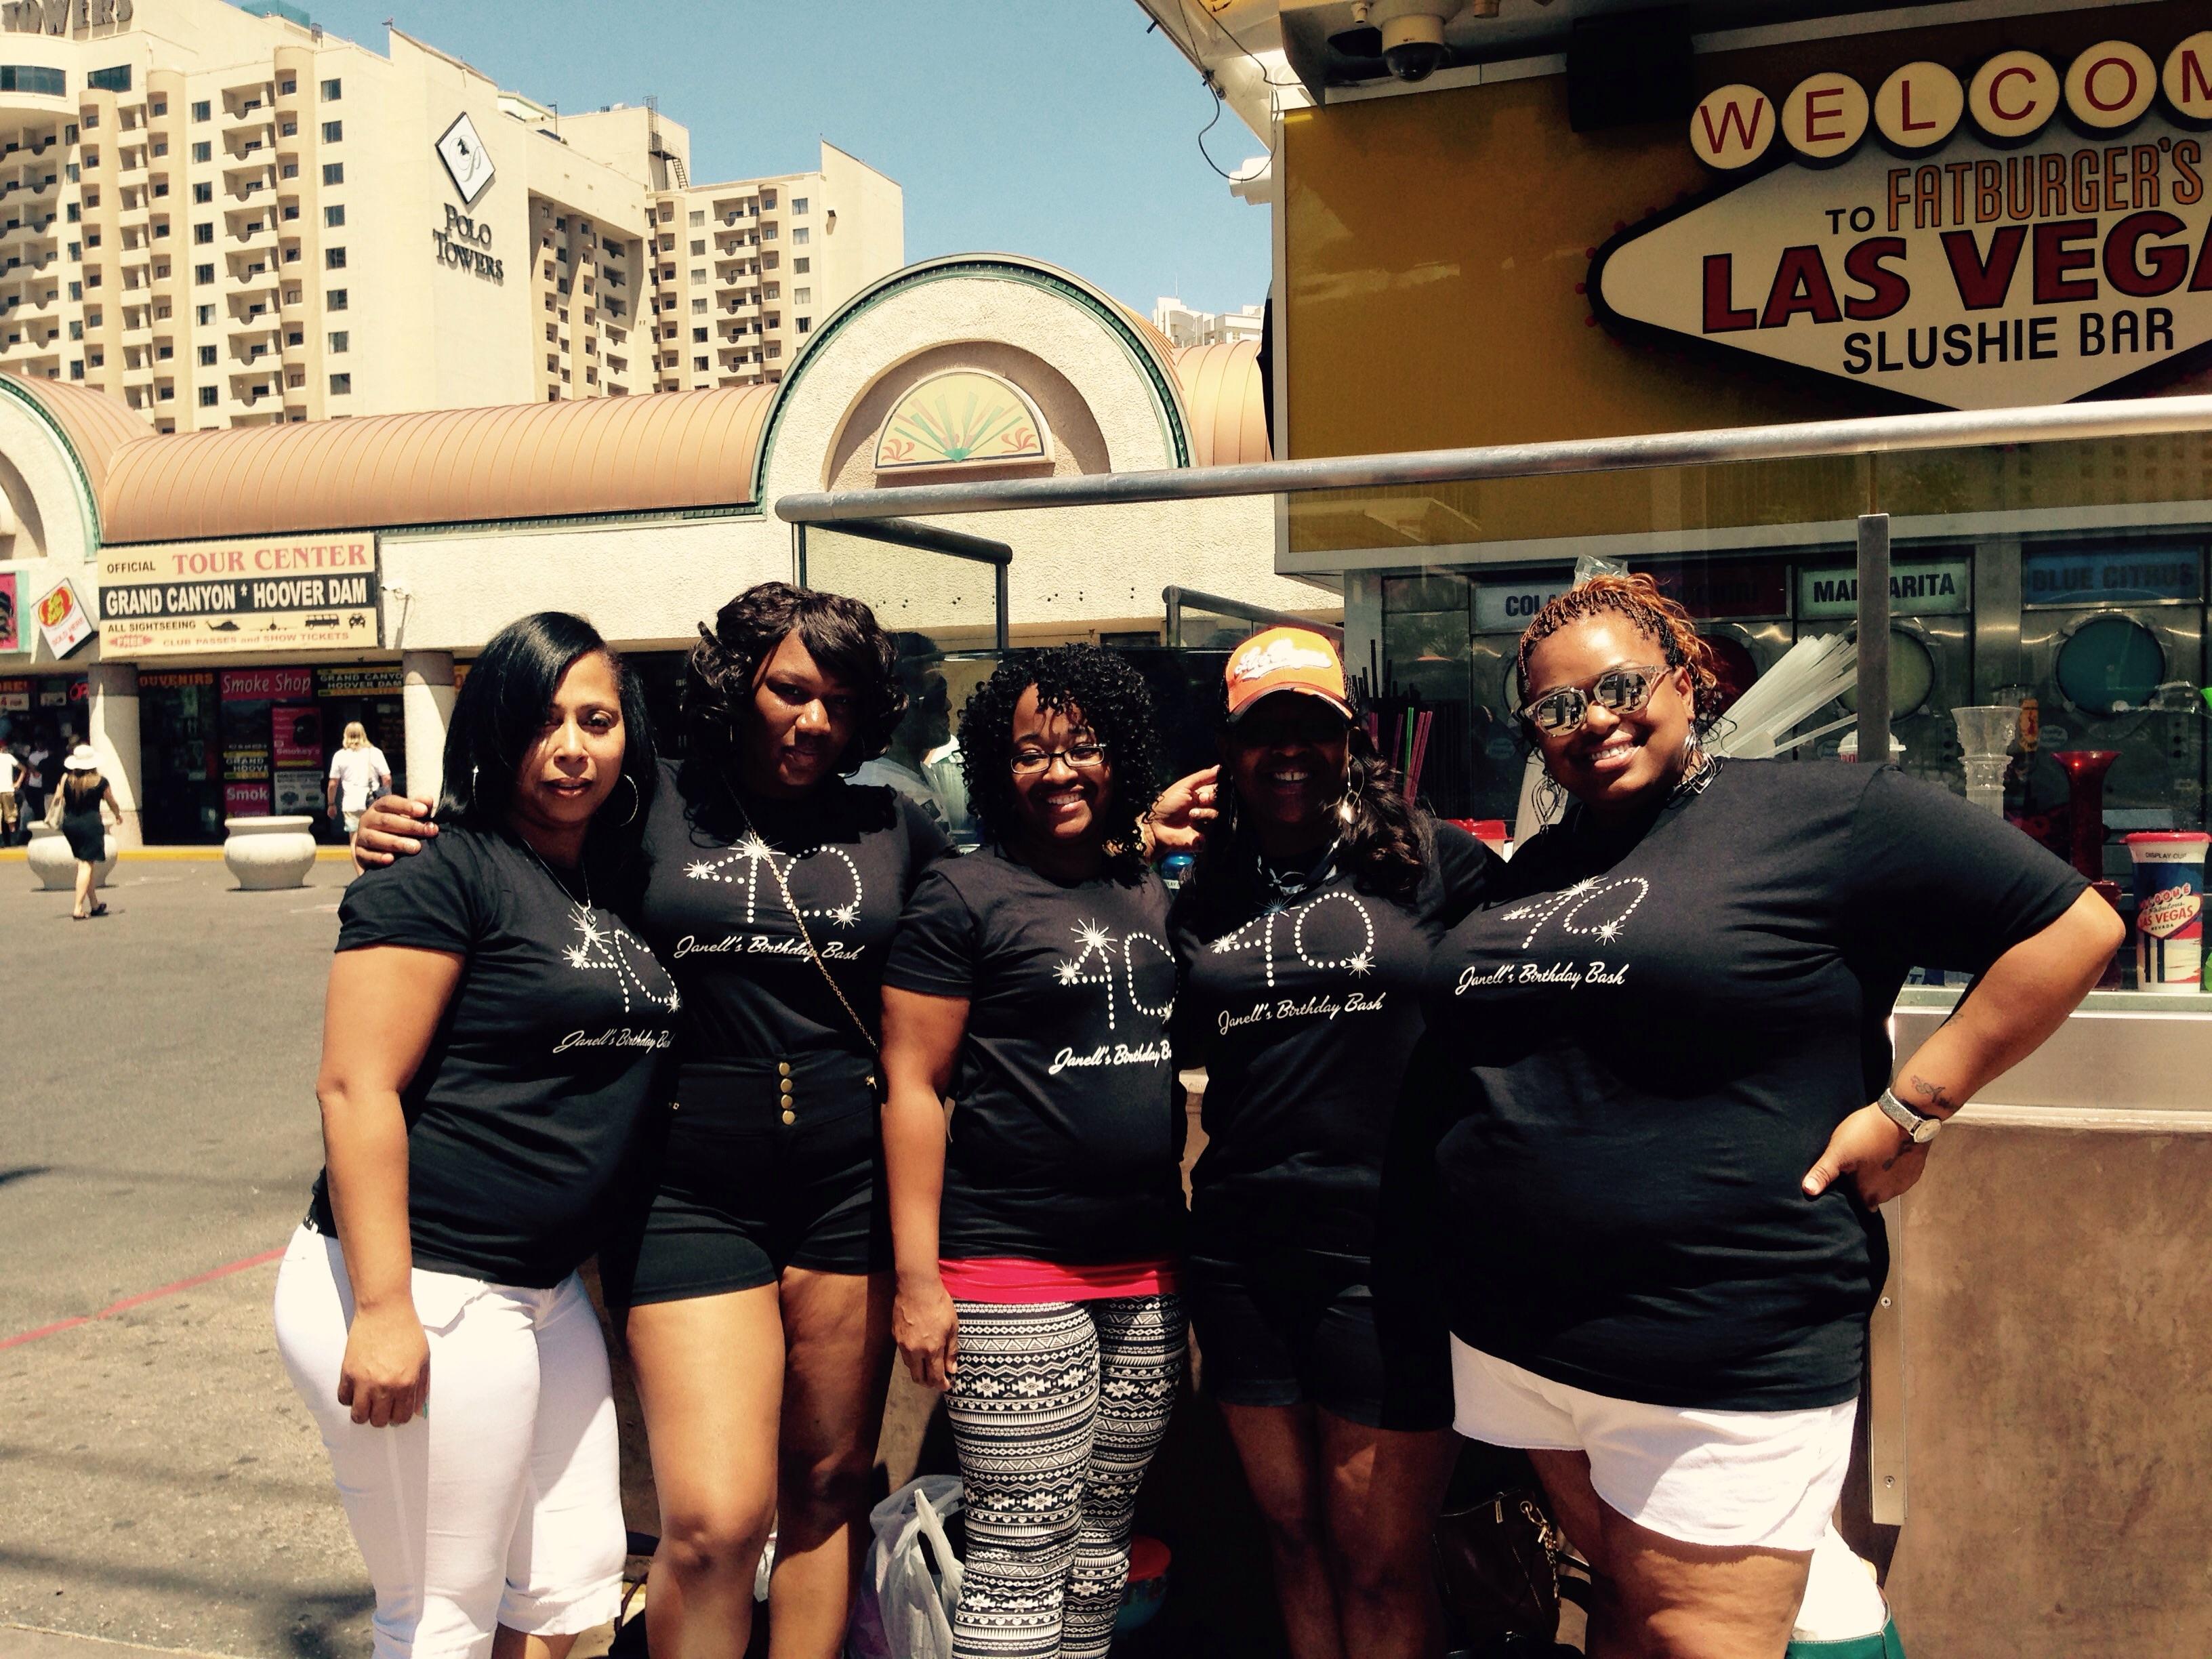 Design your own t shirt las vegas - Janell S 40th Birthday Bash T Shirt Photo